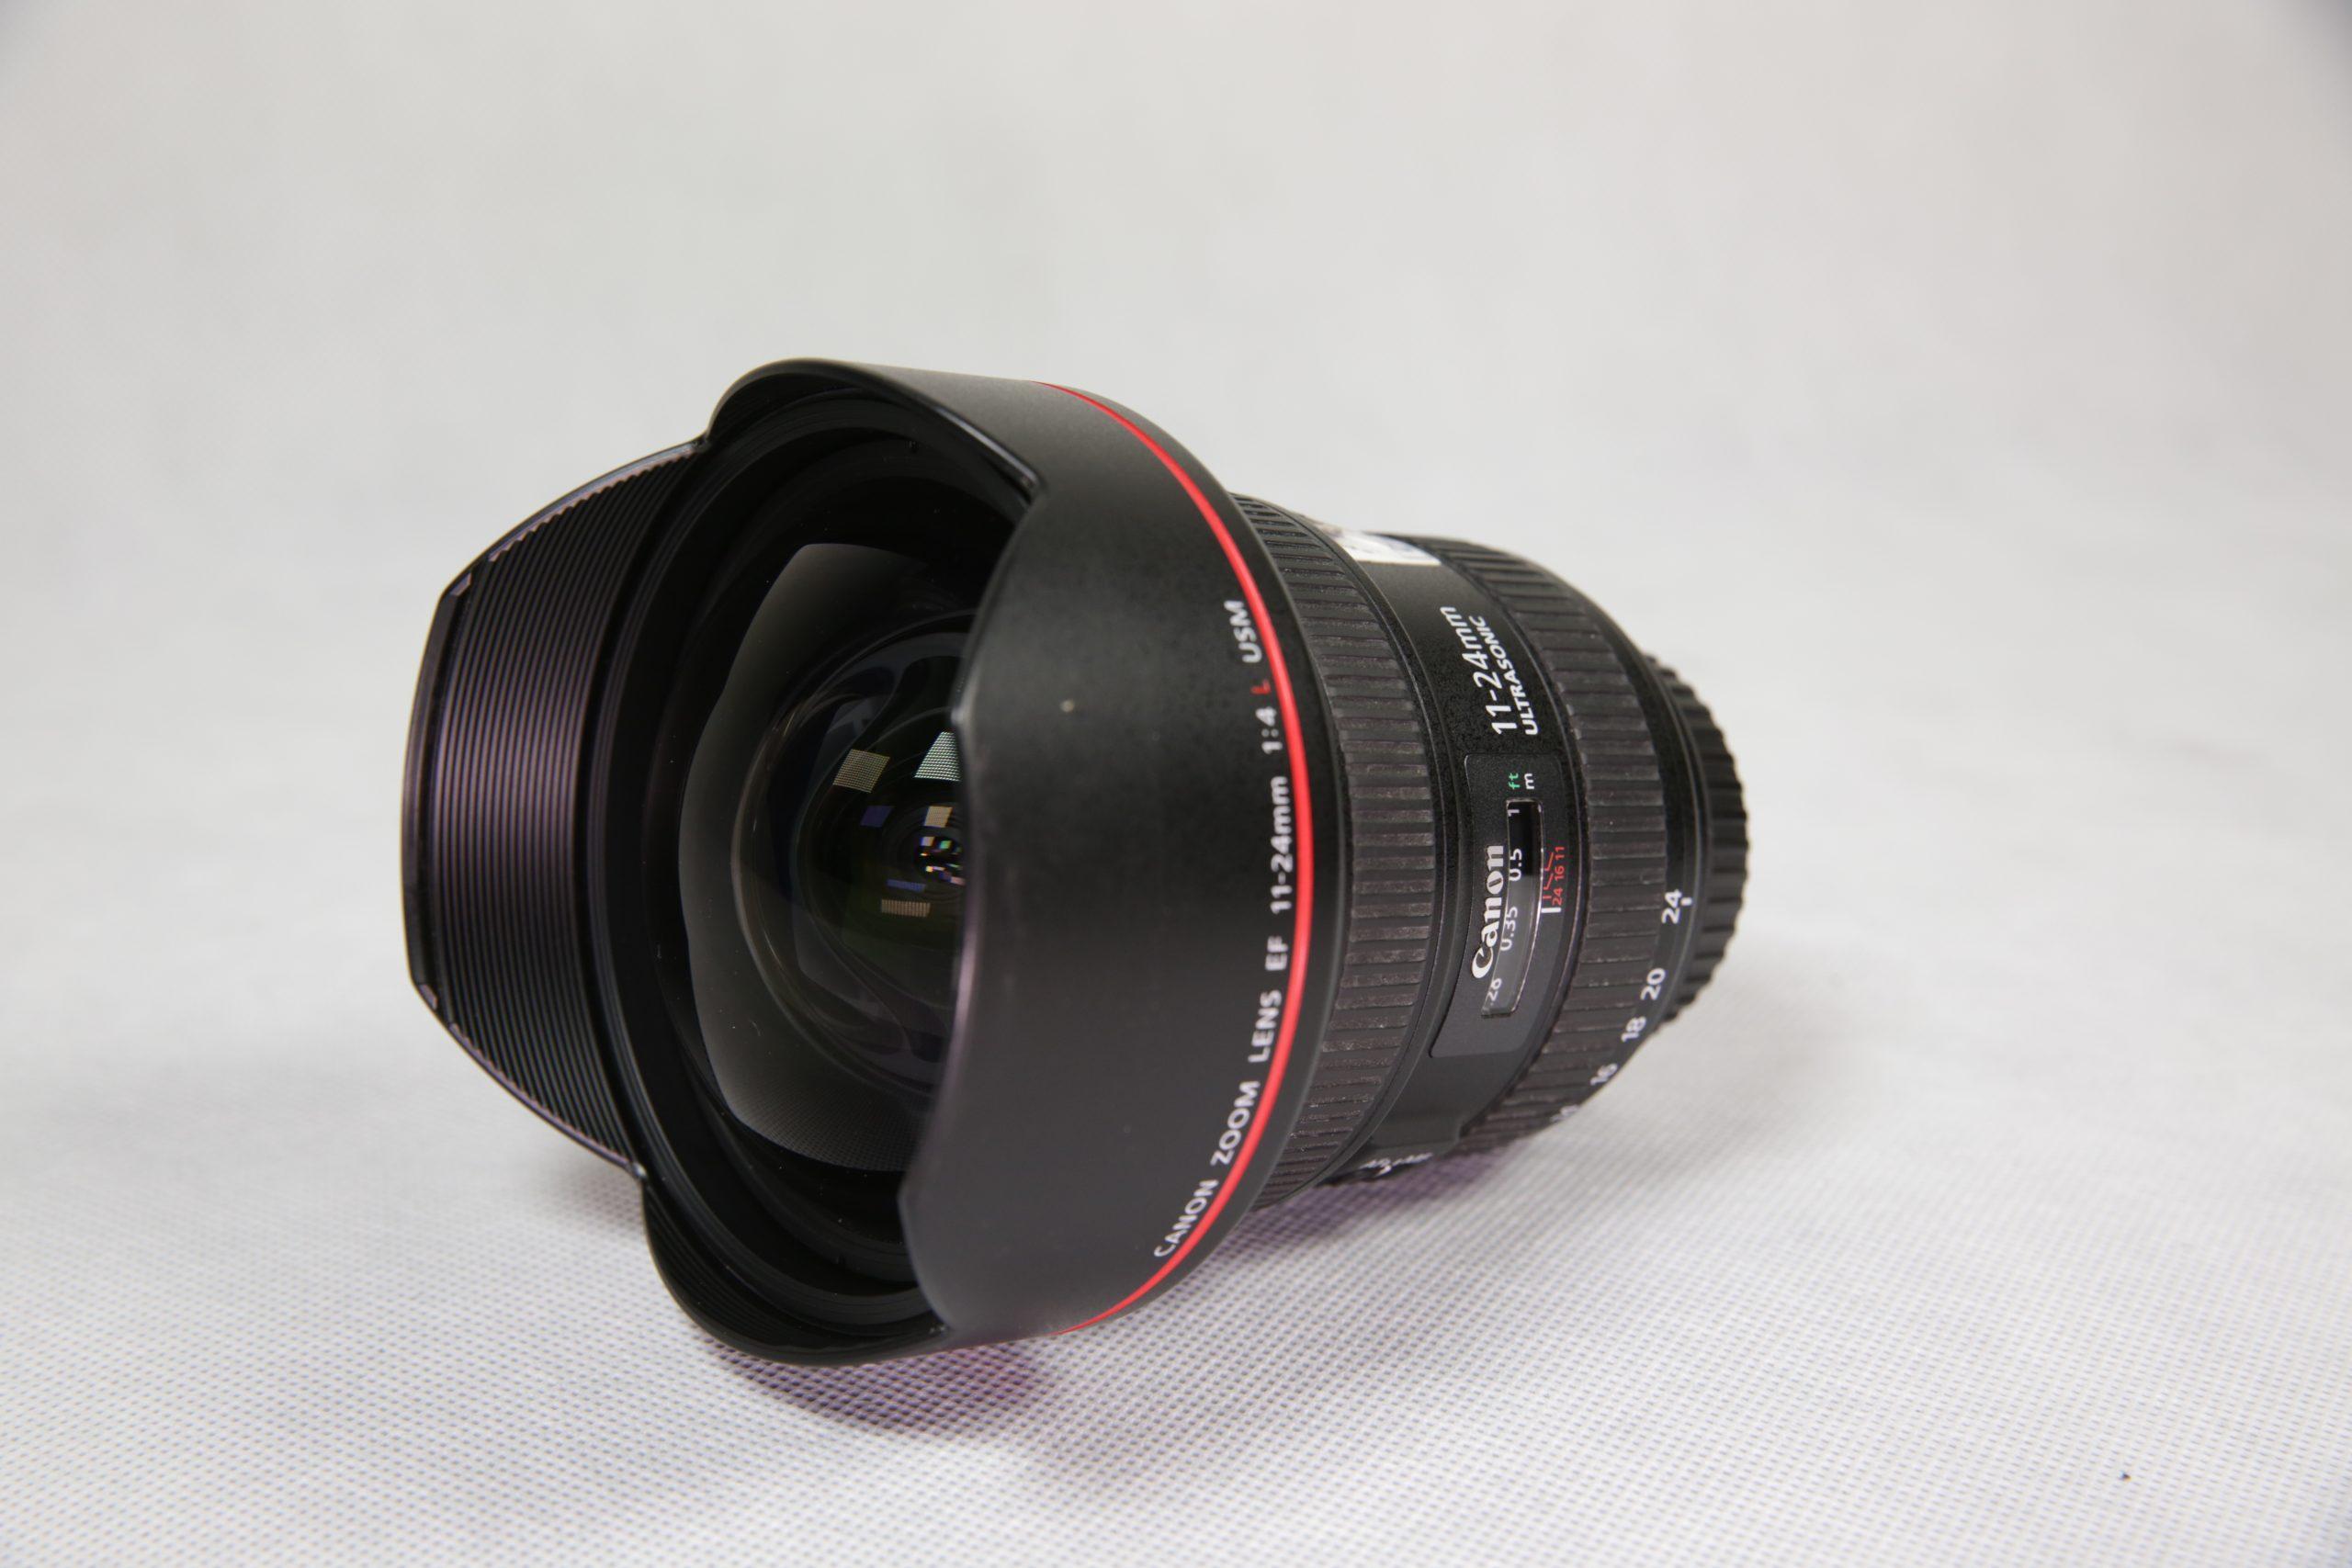 Canon 11-24mm f4.0 L USM